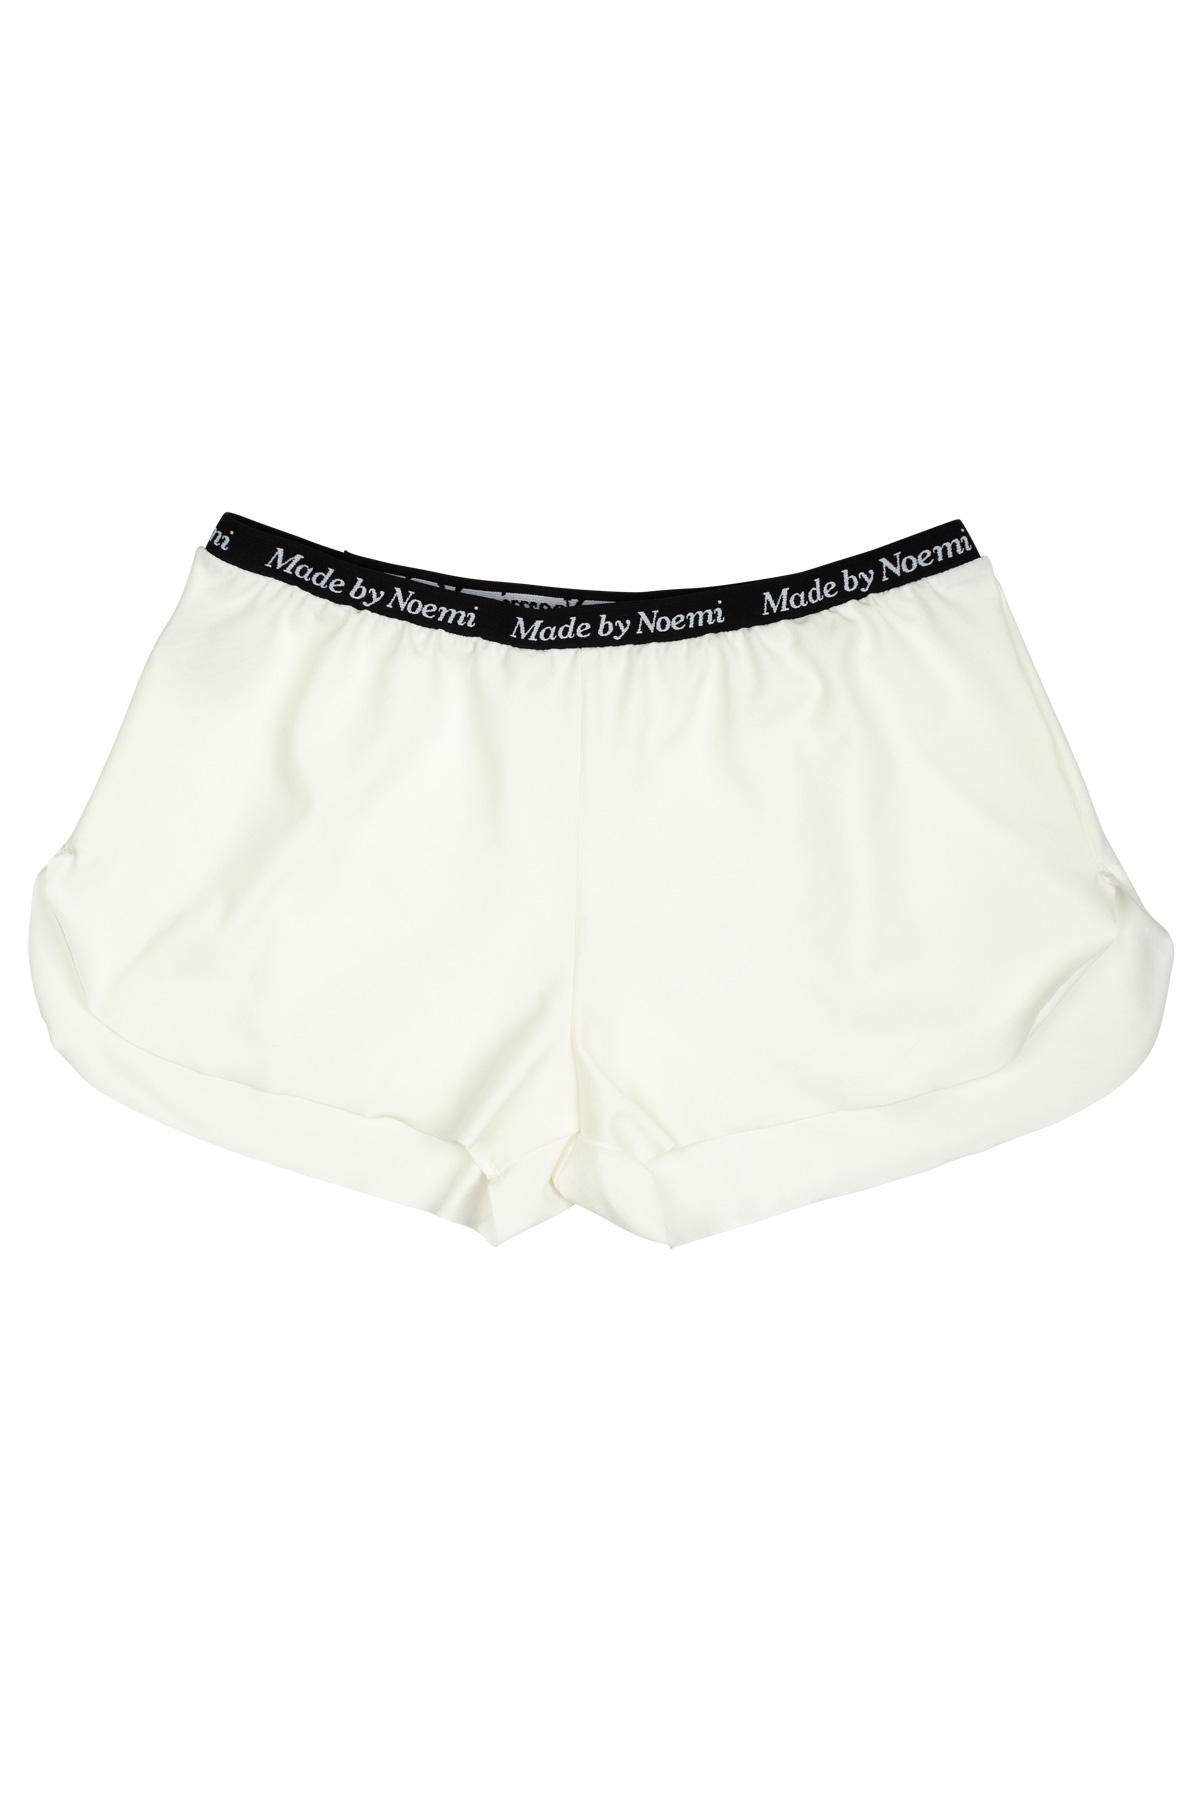 Off-white Cotton boxer shorts. Sale! Cotton underwired ... de2f30bdbb8